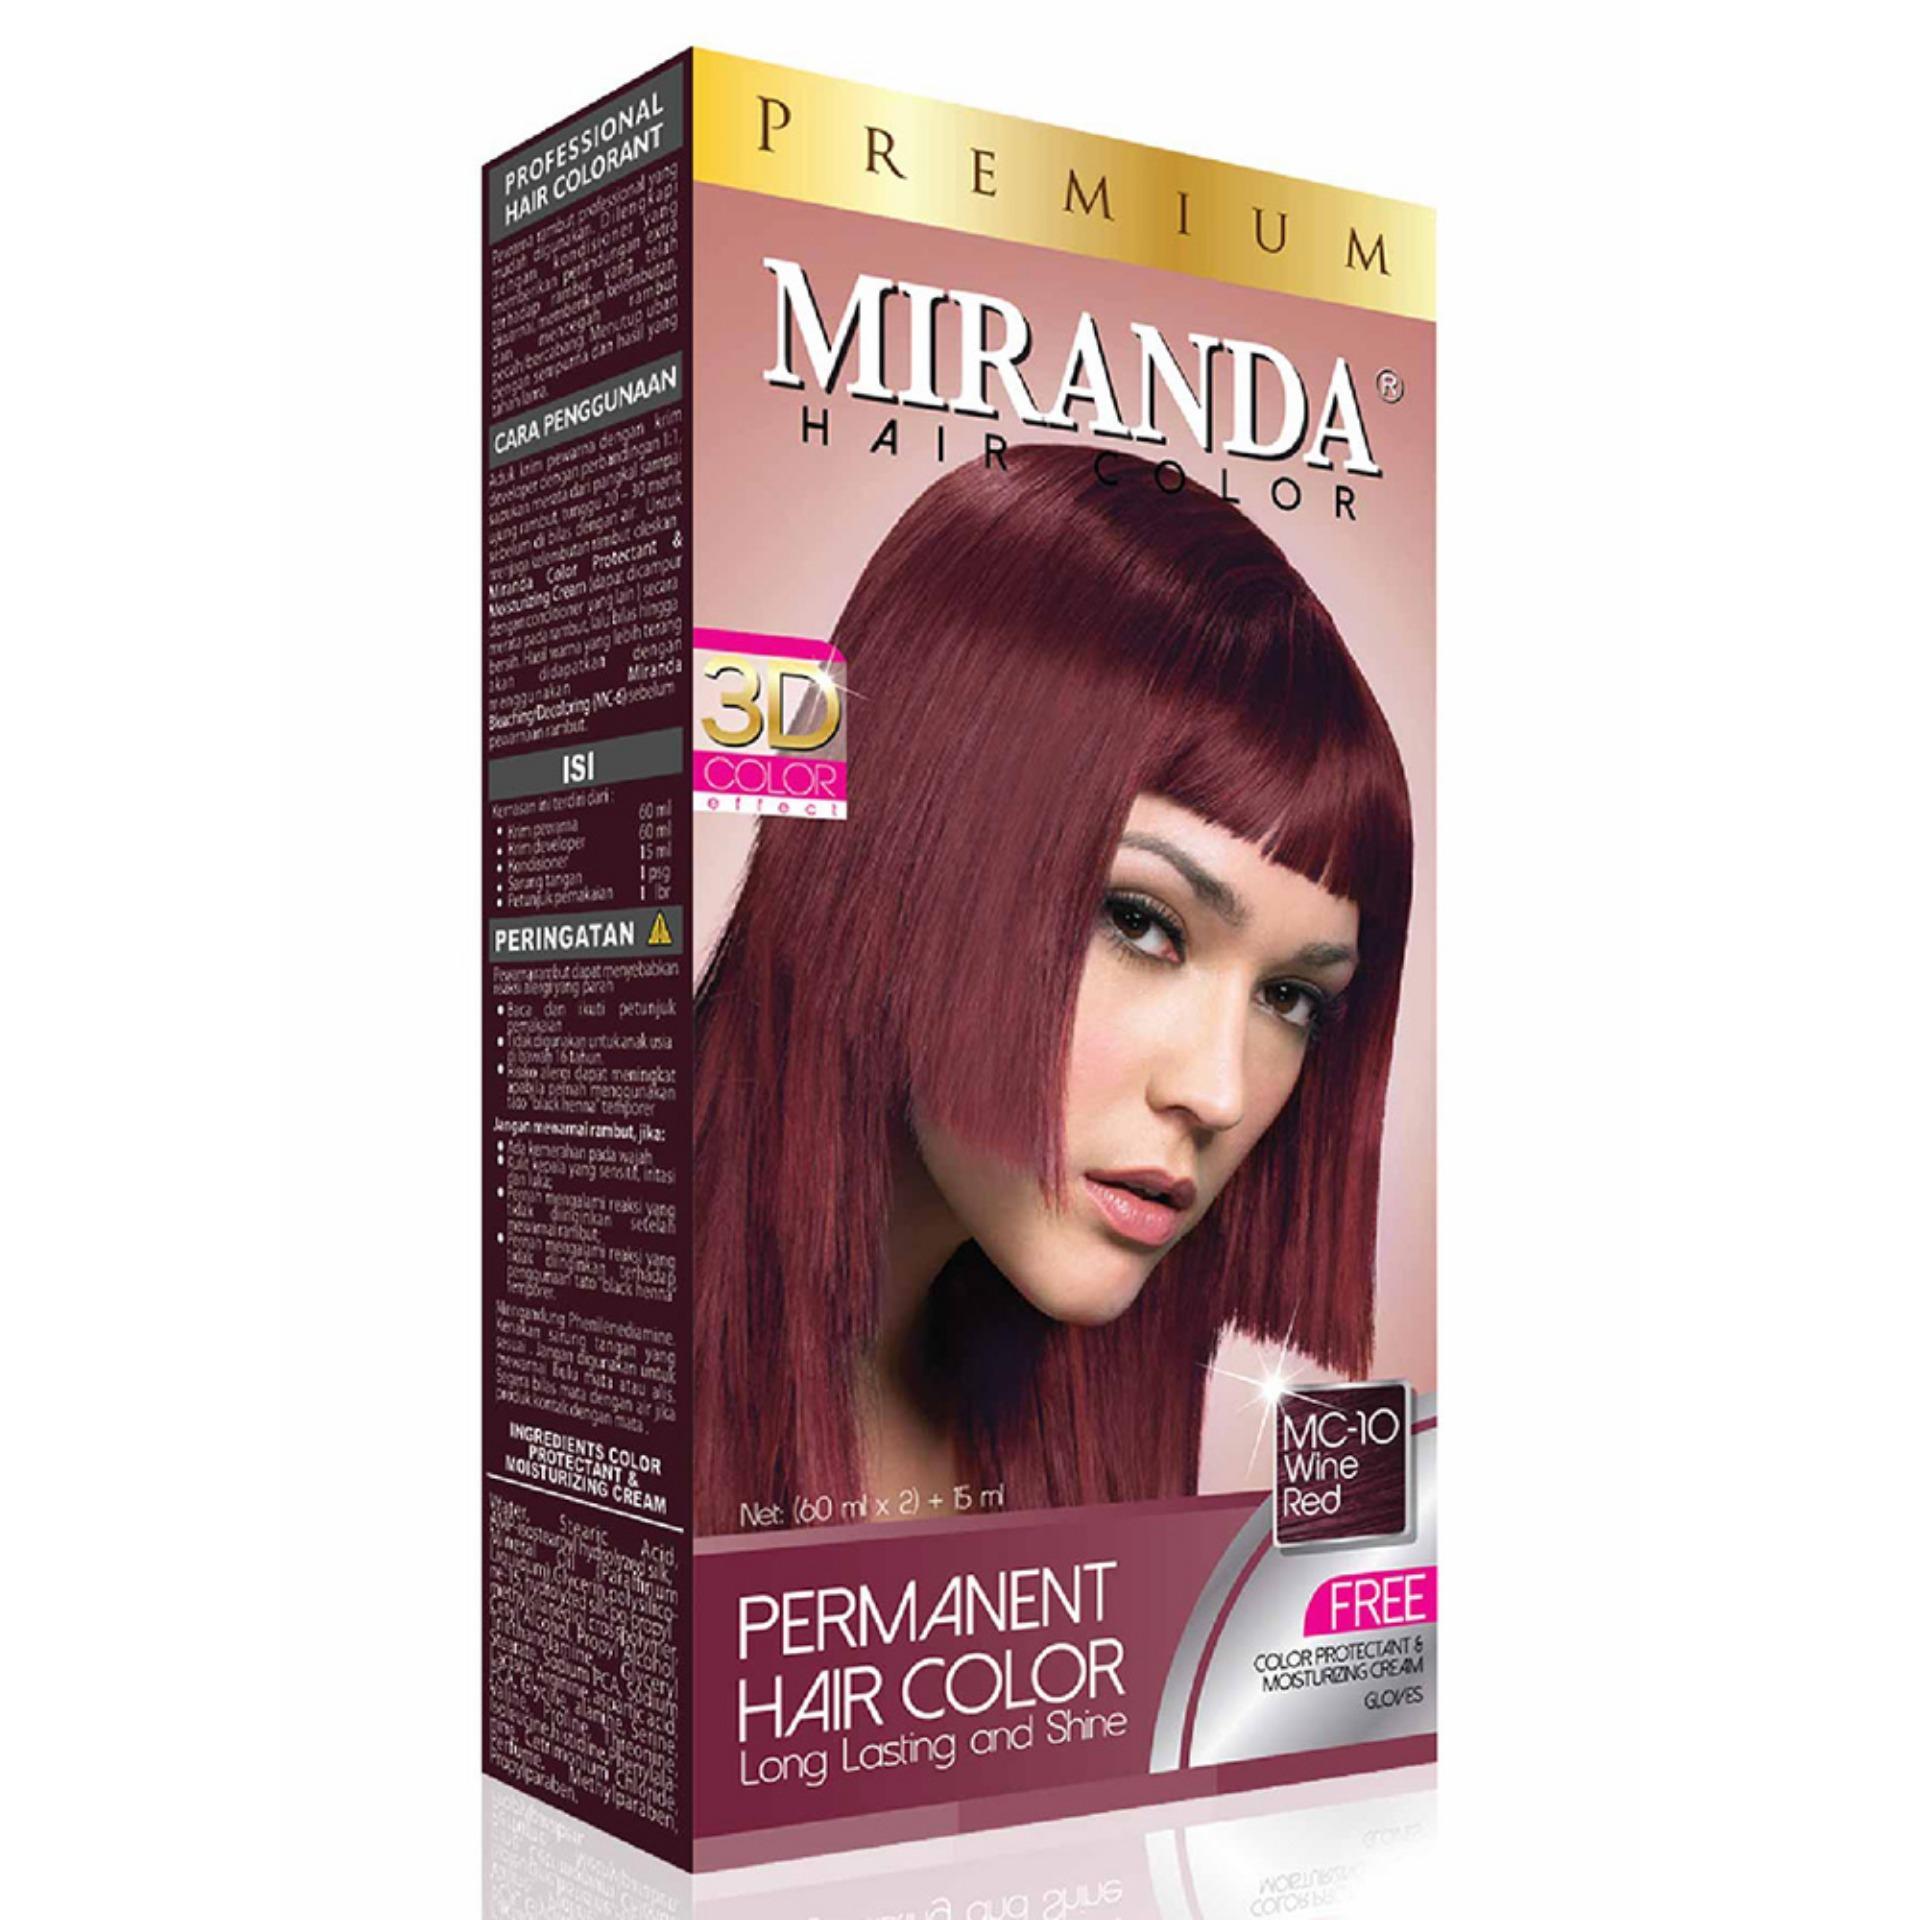 Diskon Besar Miranda Permanent Hair Color Cat Violet Red Mc 08 ... be0d33c740